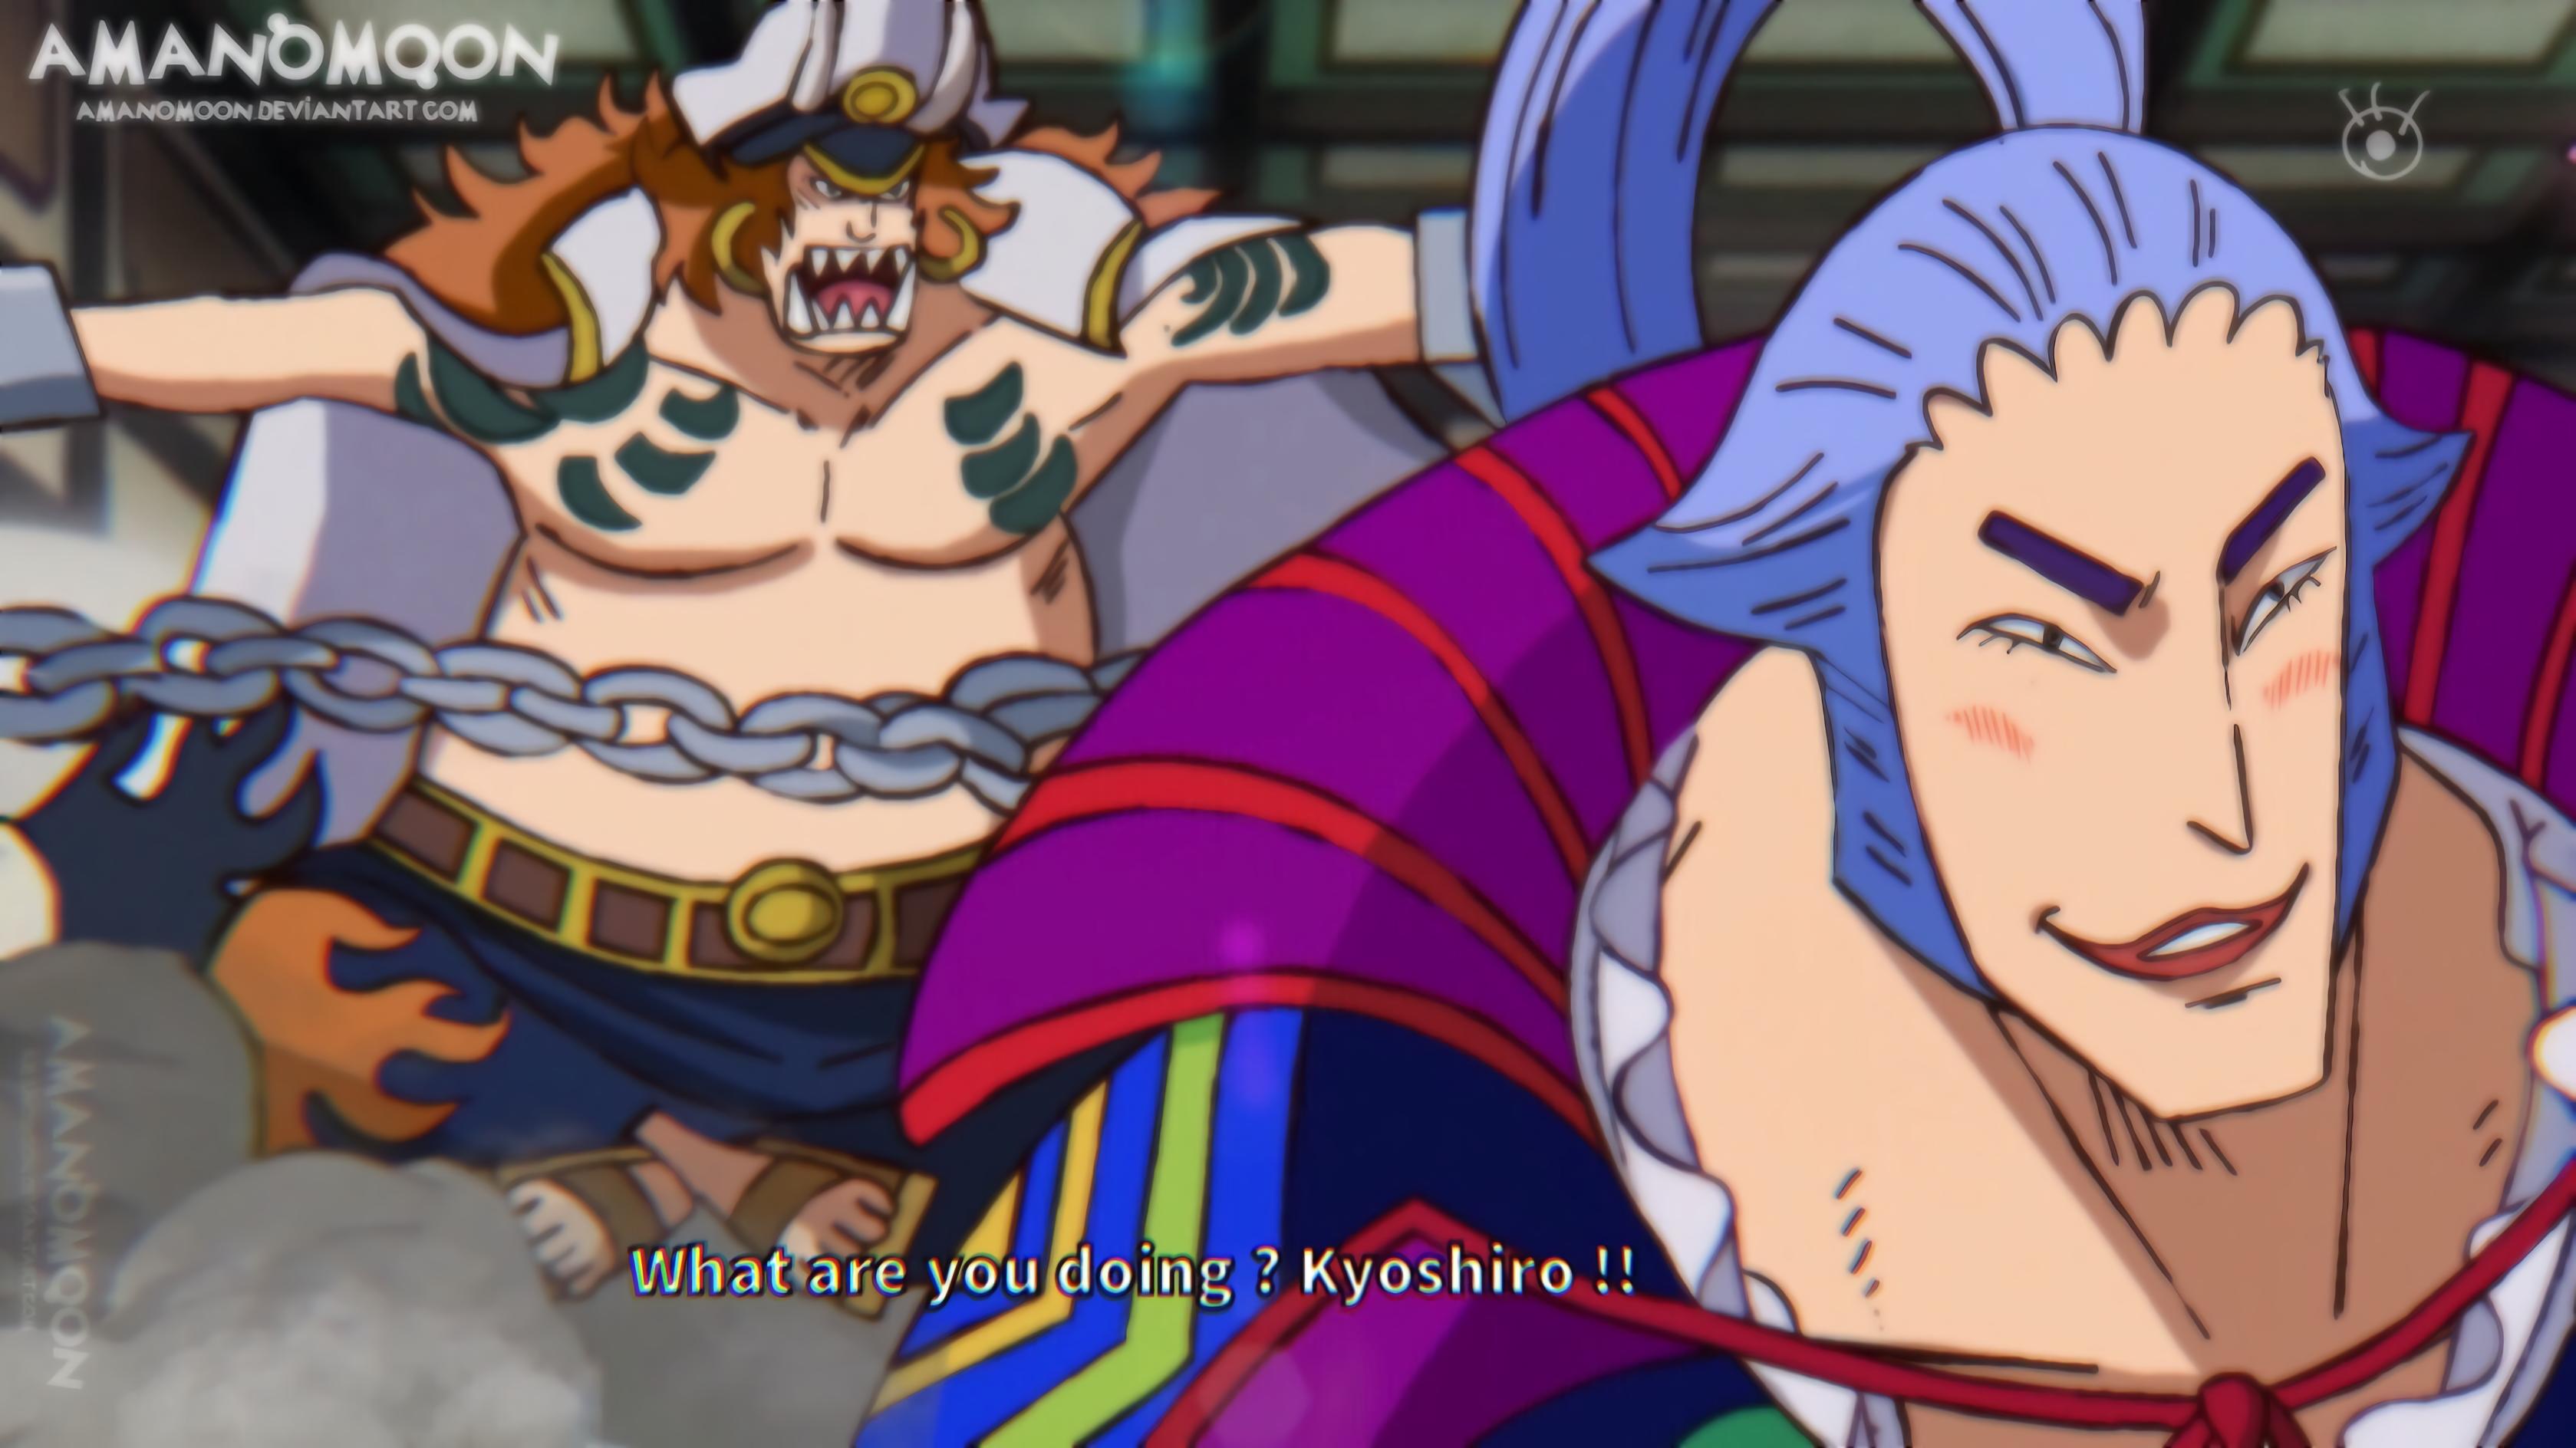 One Piece Chapter 982 Kyoshiro Sasaki Anime Style By Amanomoon On Deviantart